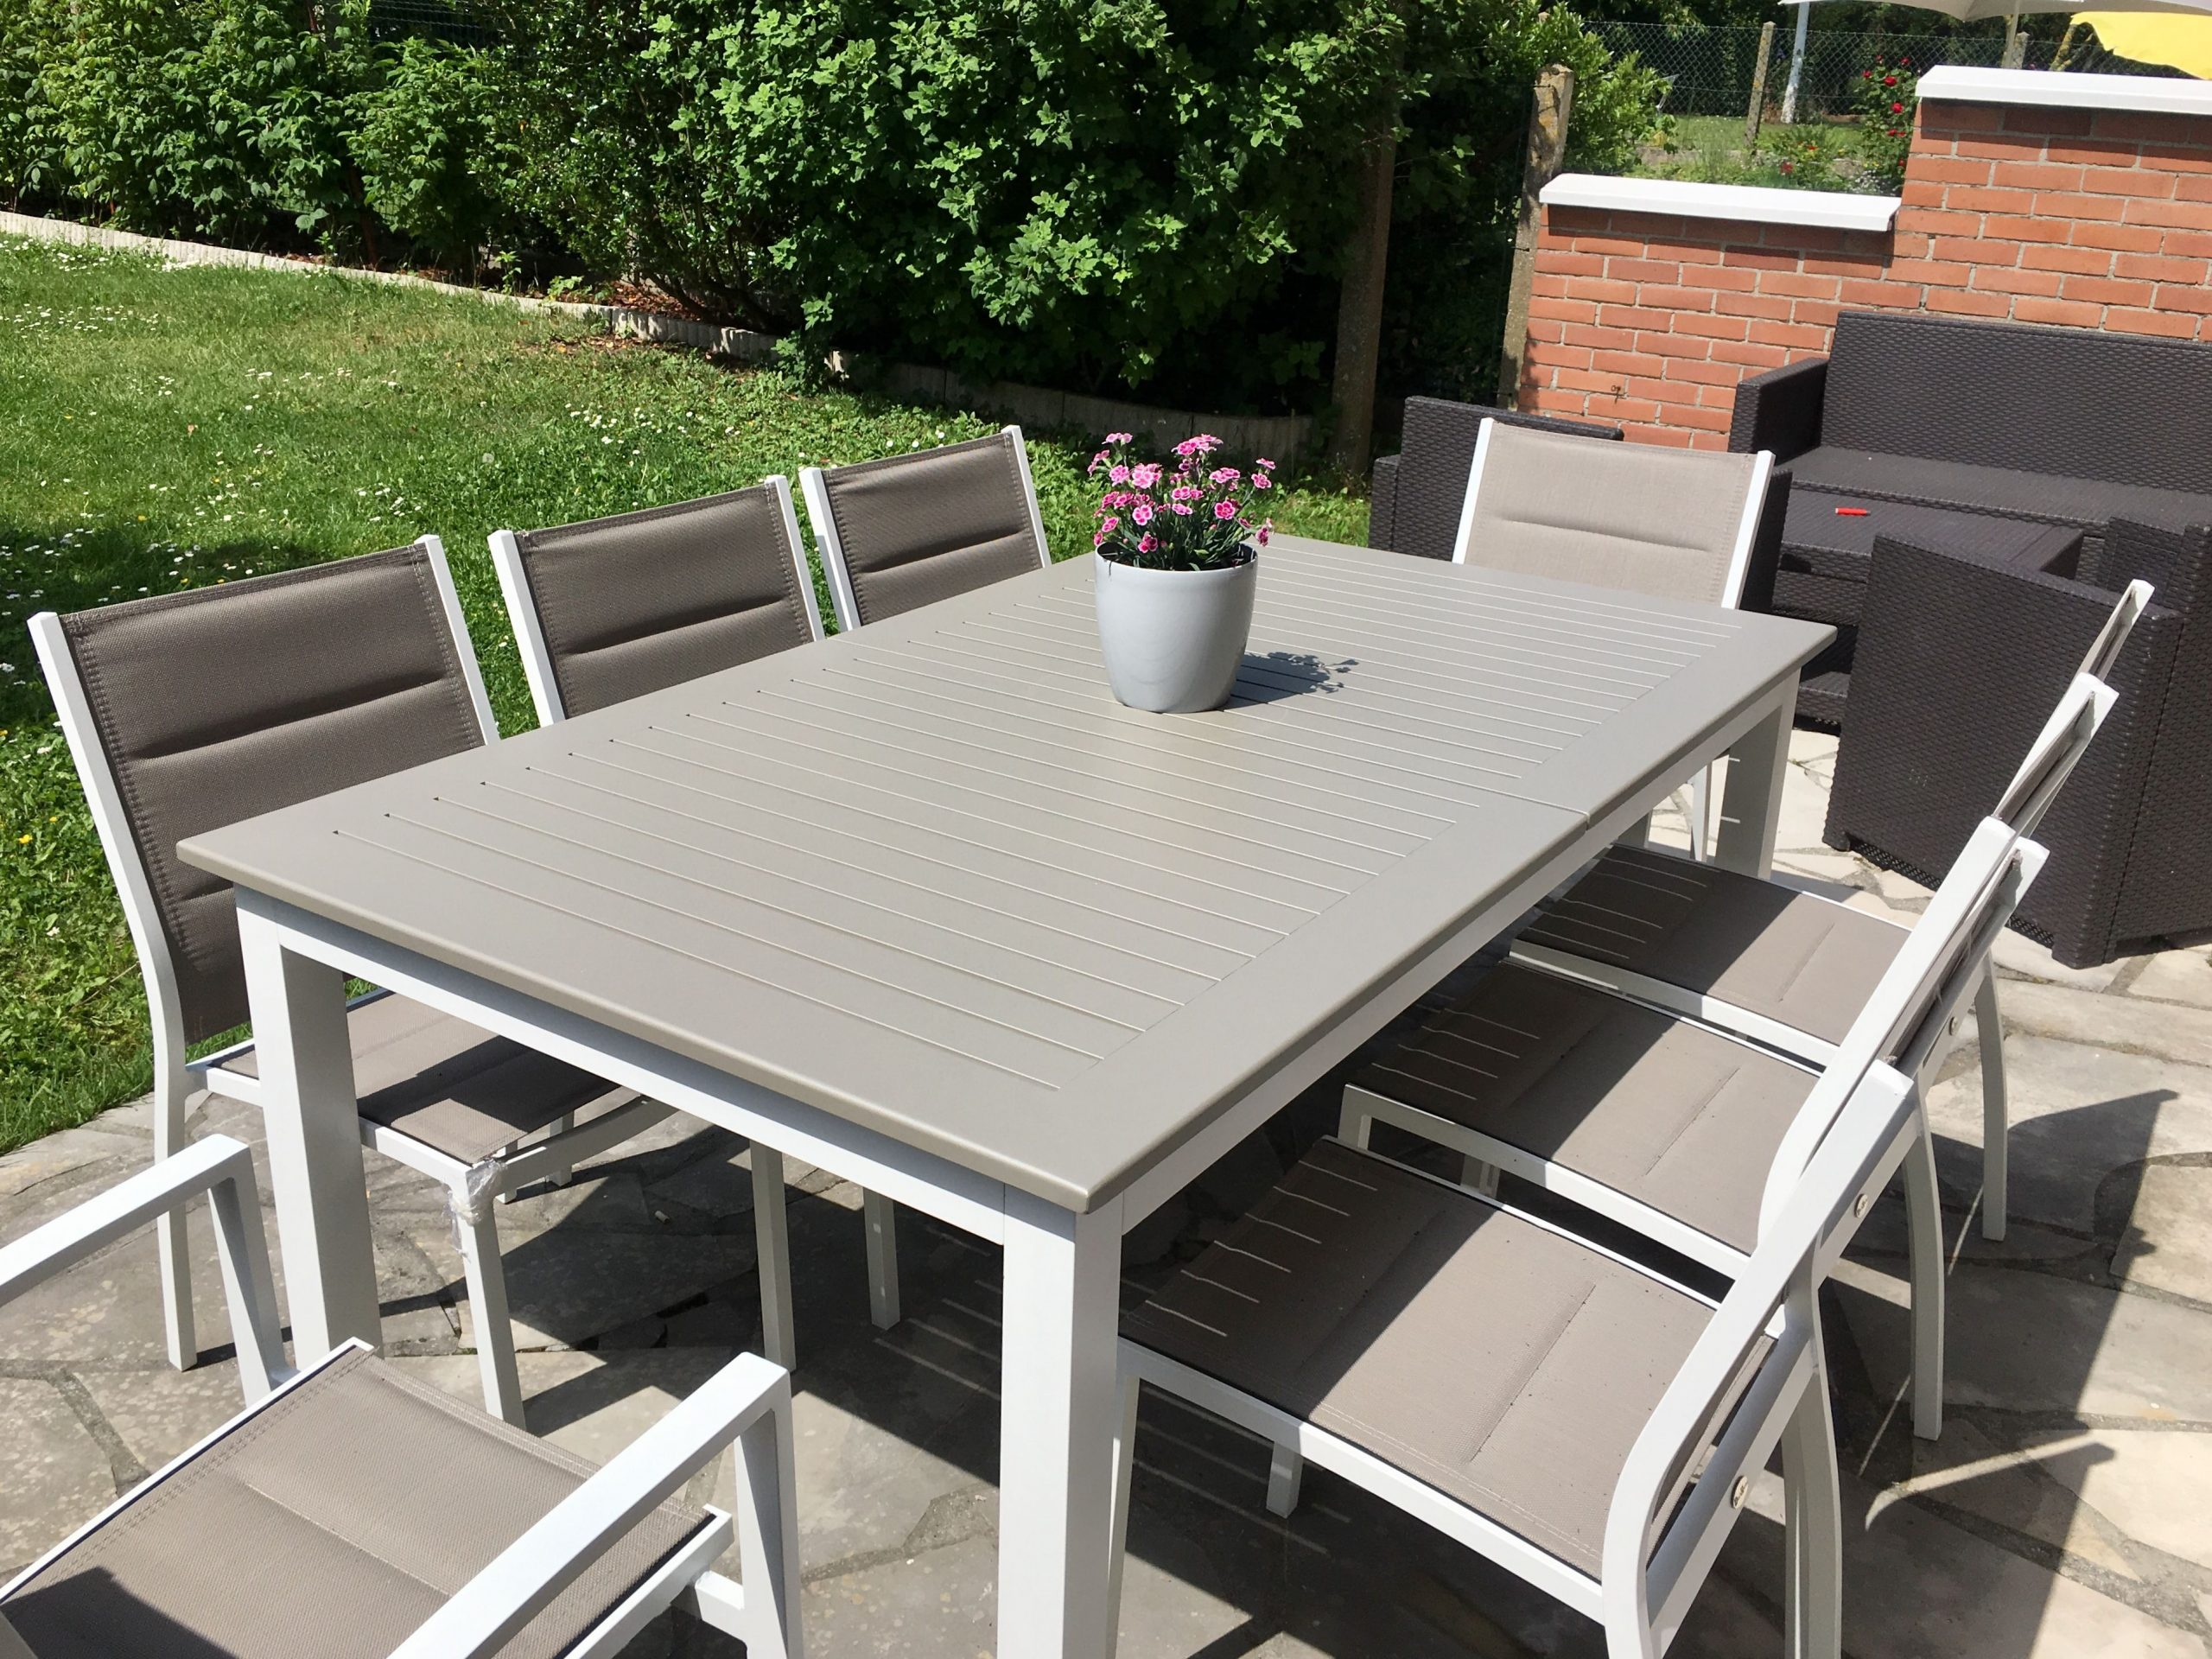 Chicago Alice's Garden : Table De Jardin À Rallonge ... concernant Table De Jardin En Aluminium Avec Rallonge